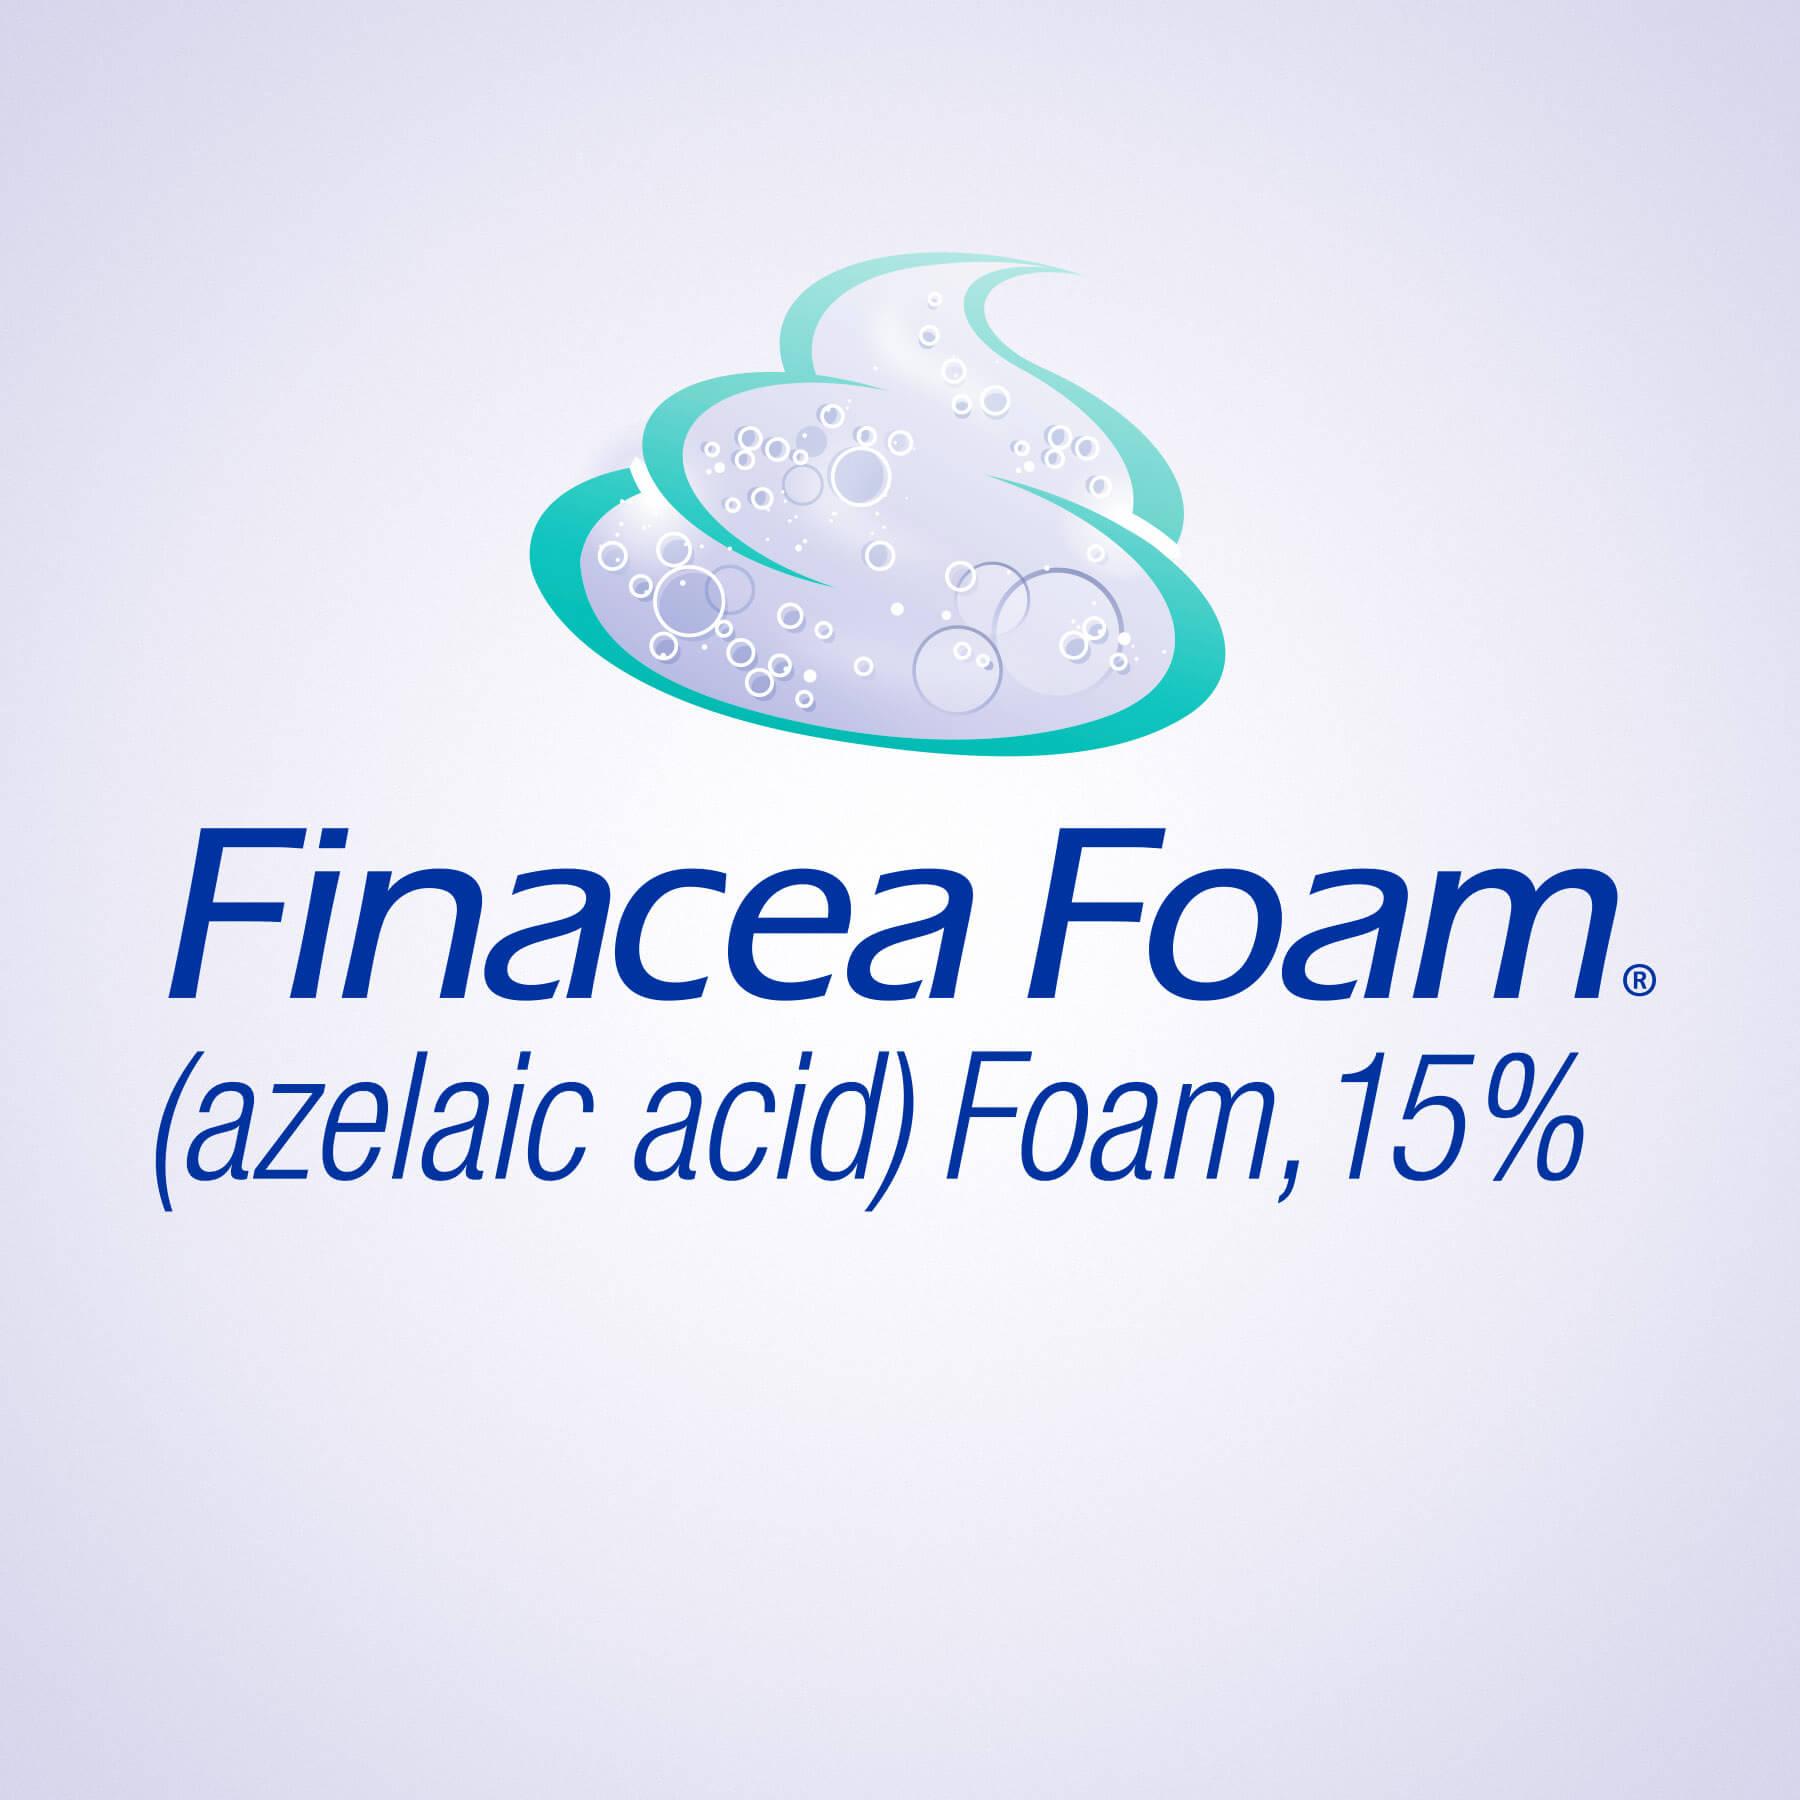 Finacea Foam Logo